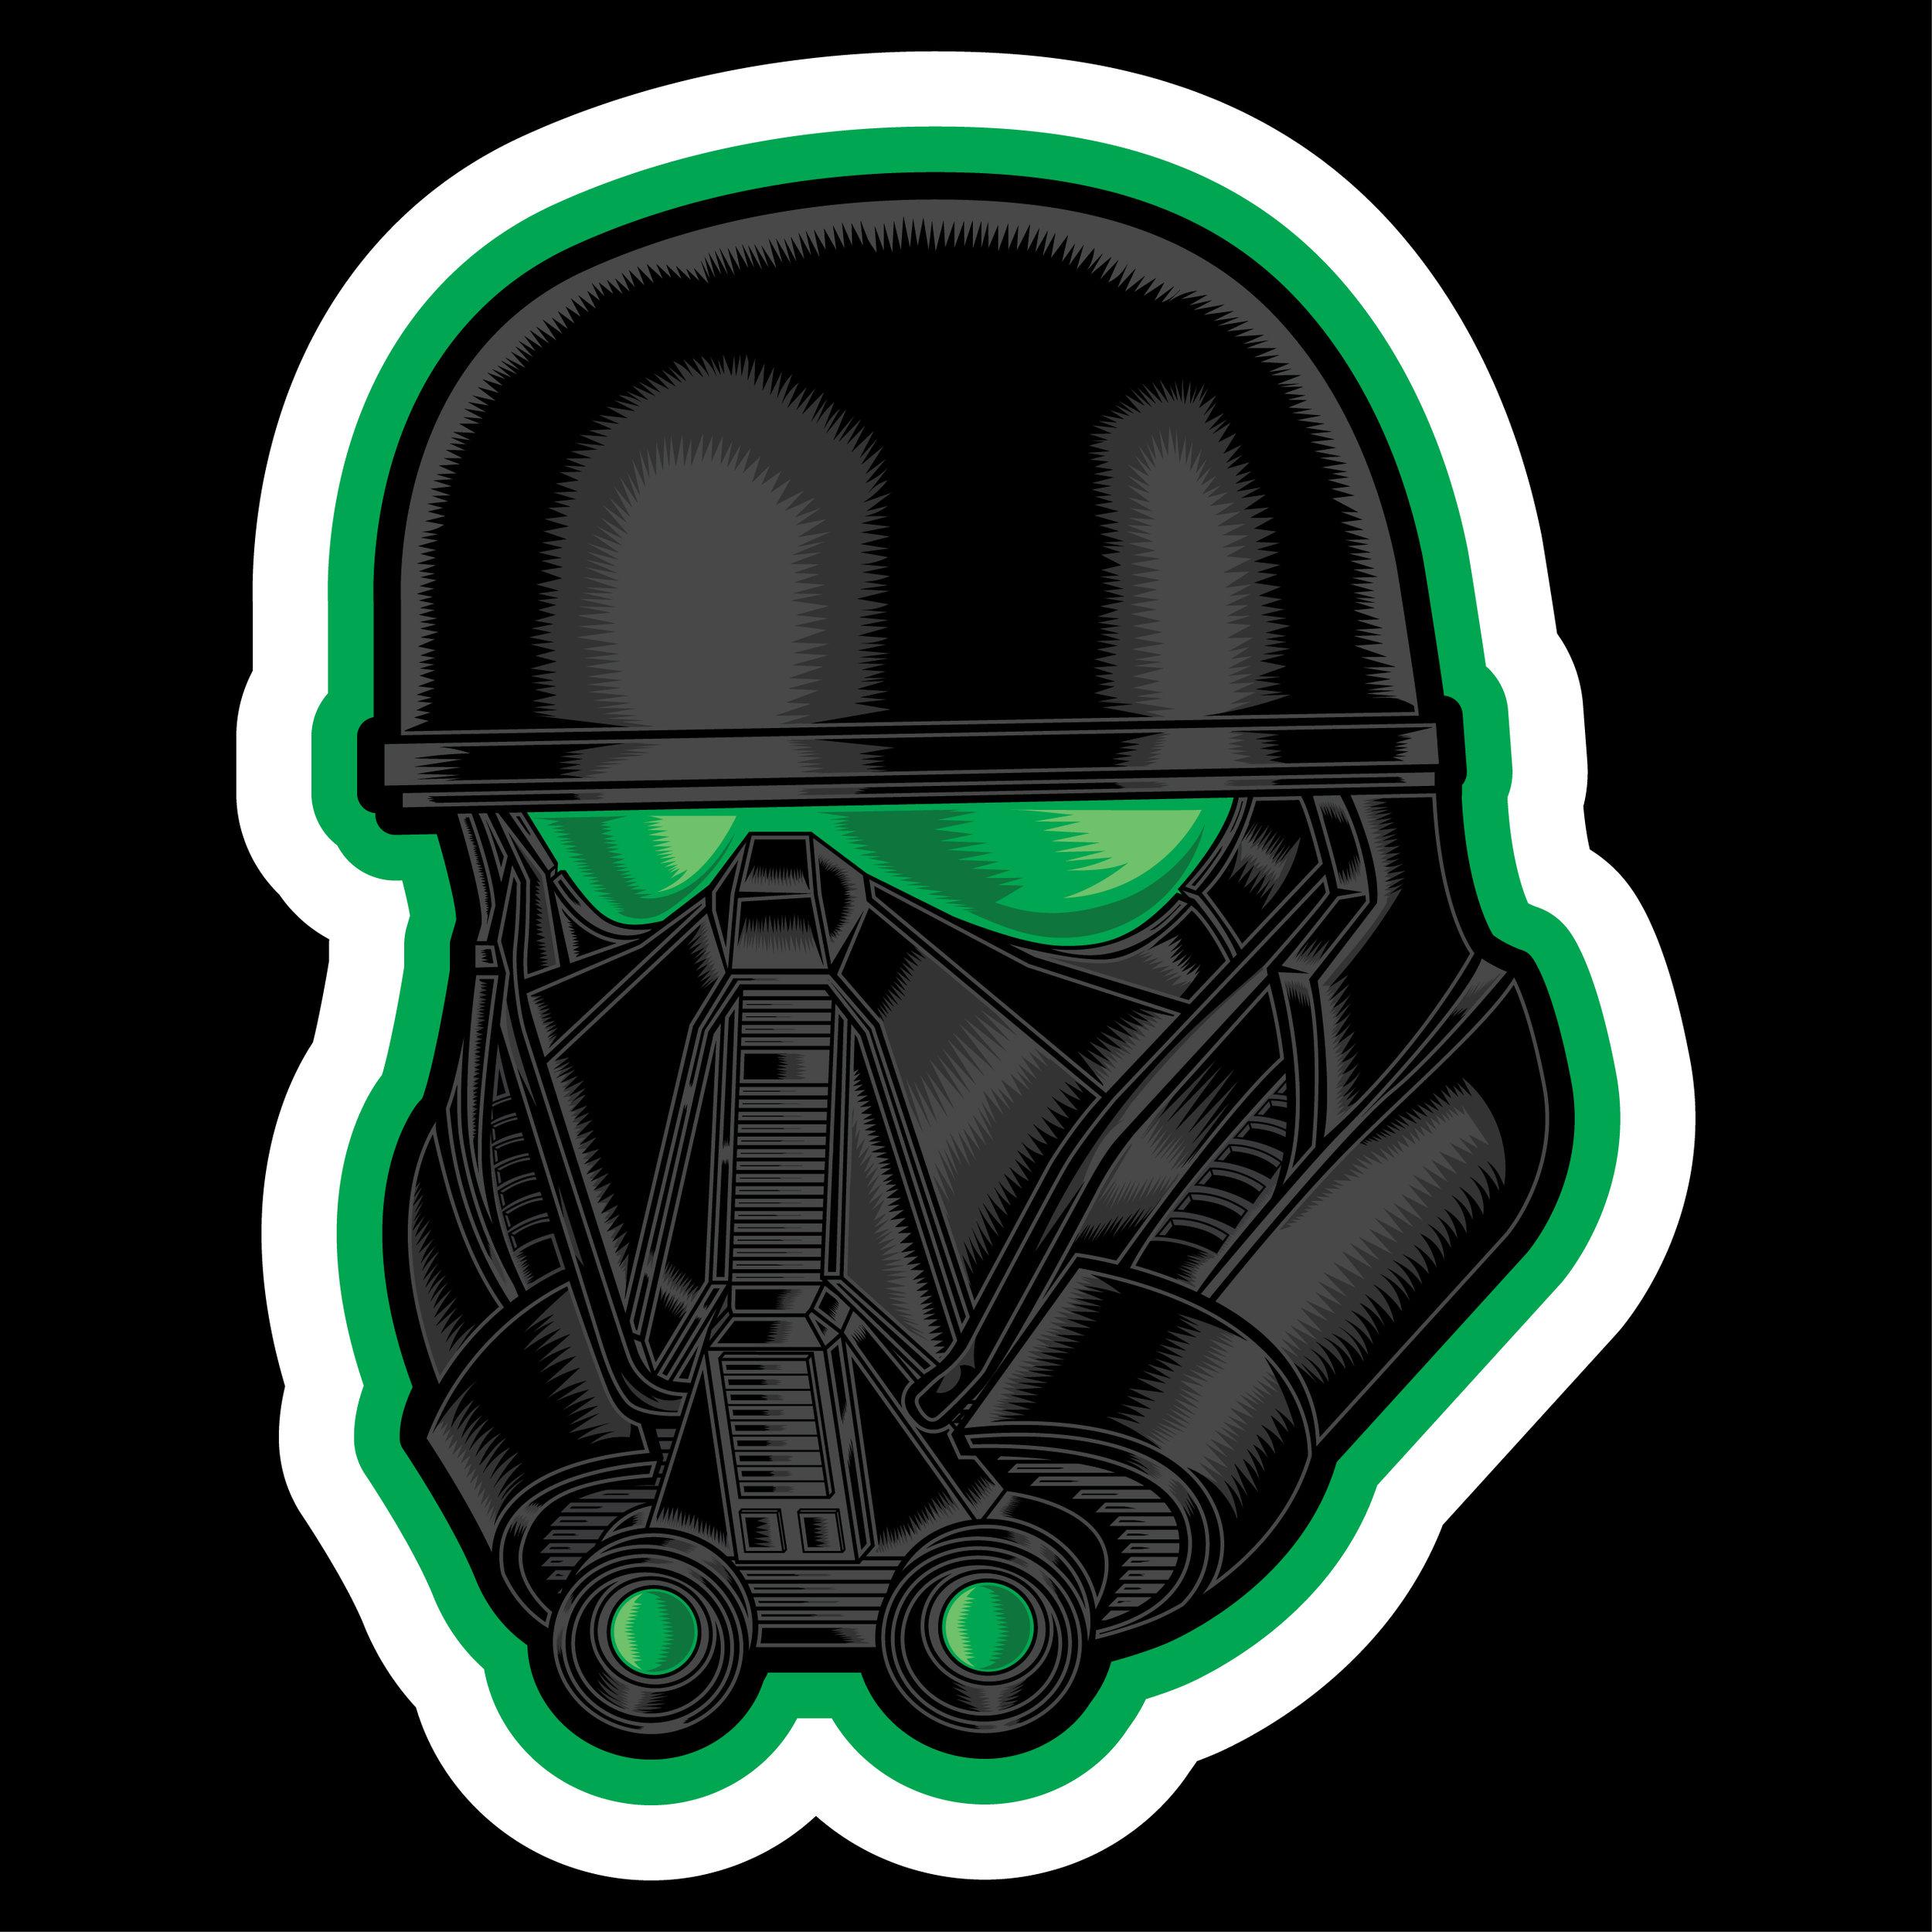 DeathTrooper-Social_1.jpg